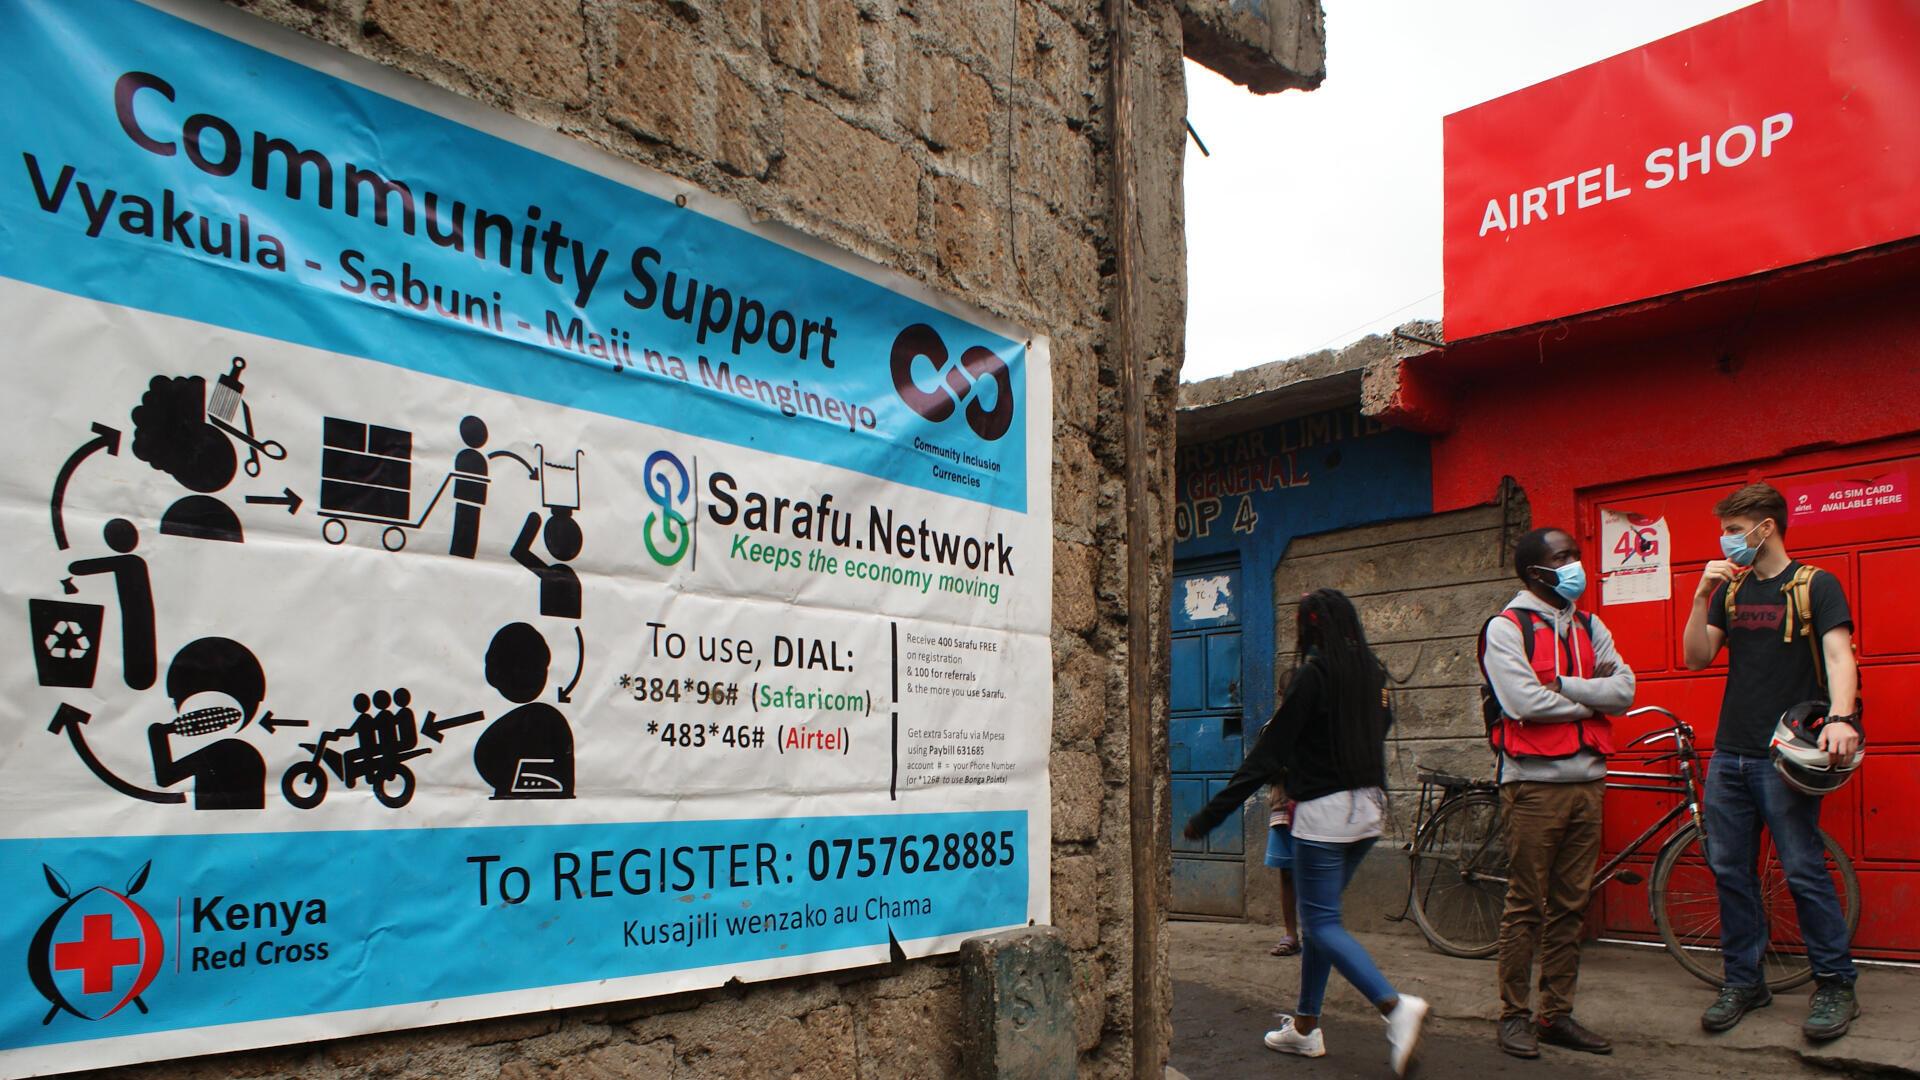 campagne-croix-rouge-cryptomonnaie-sarafu-kenya-Mukuru-Kayiaba-nairobi-juillet-2021